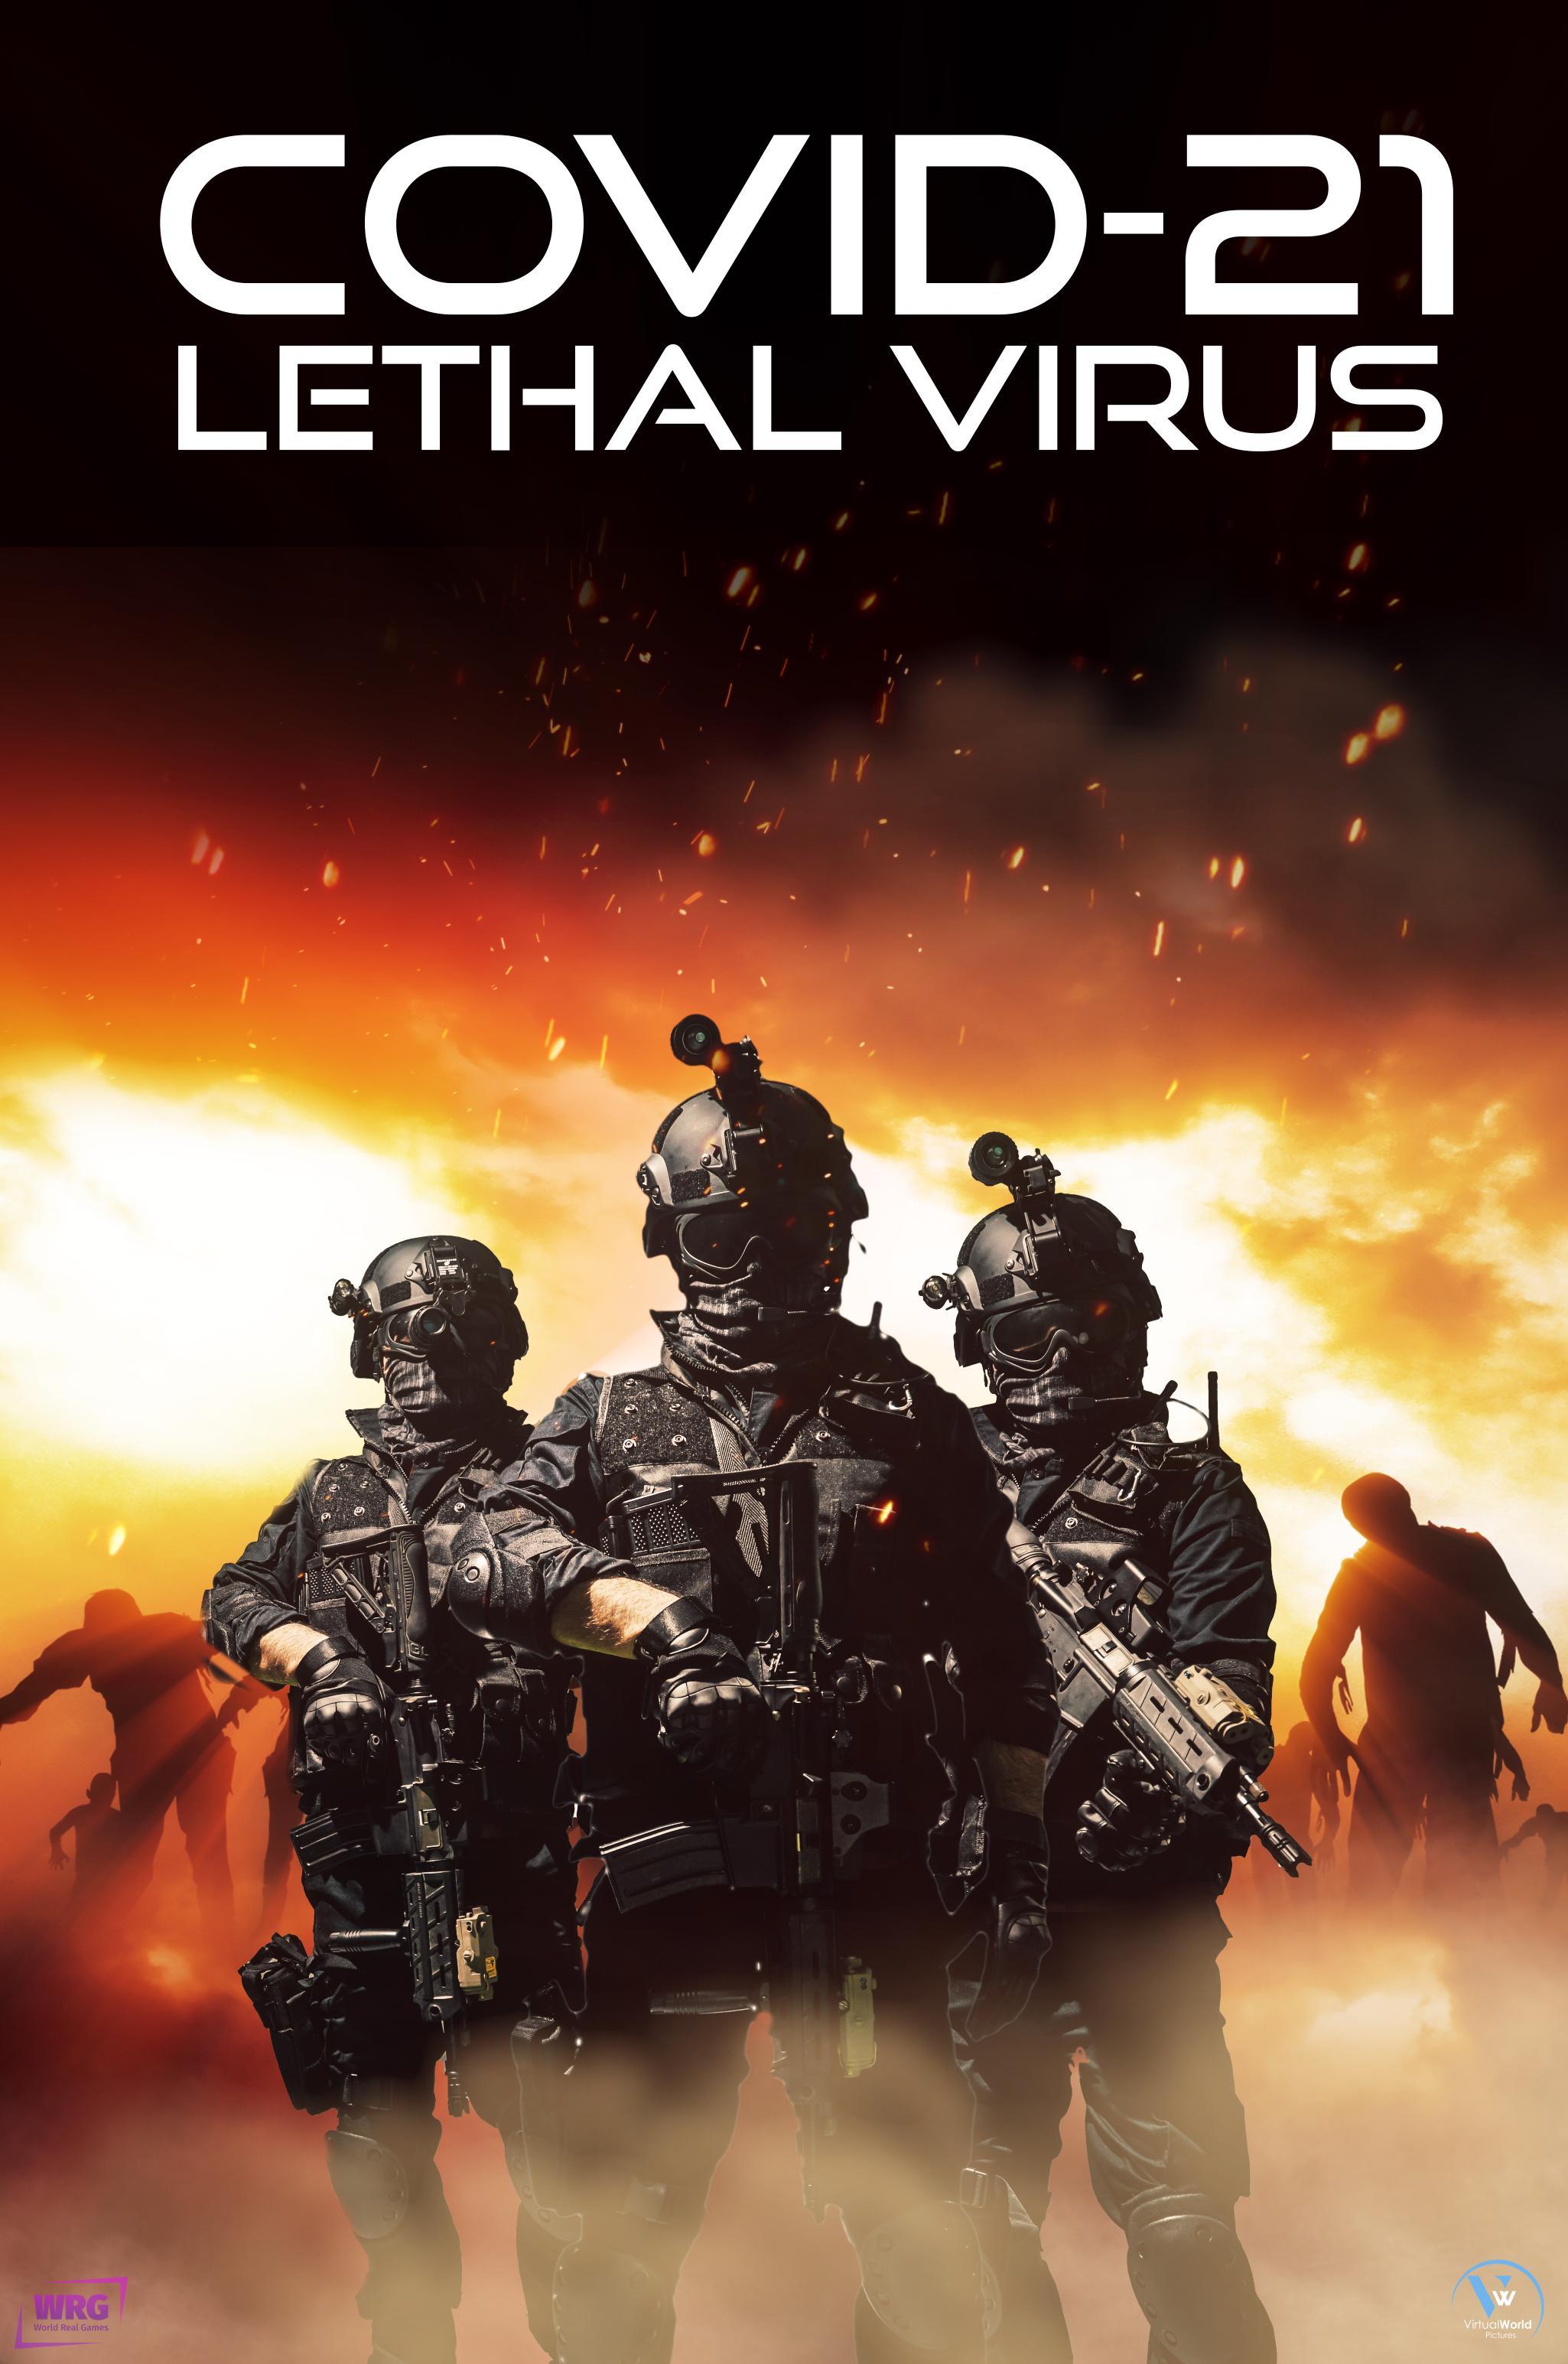 COVID-21: Lethal Virus (2021) - Photo Gallery - IMDb